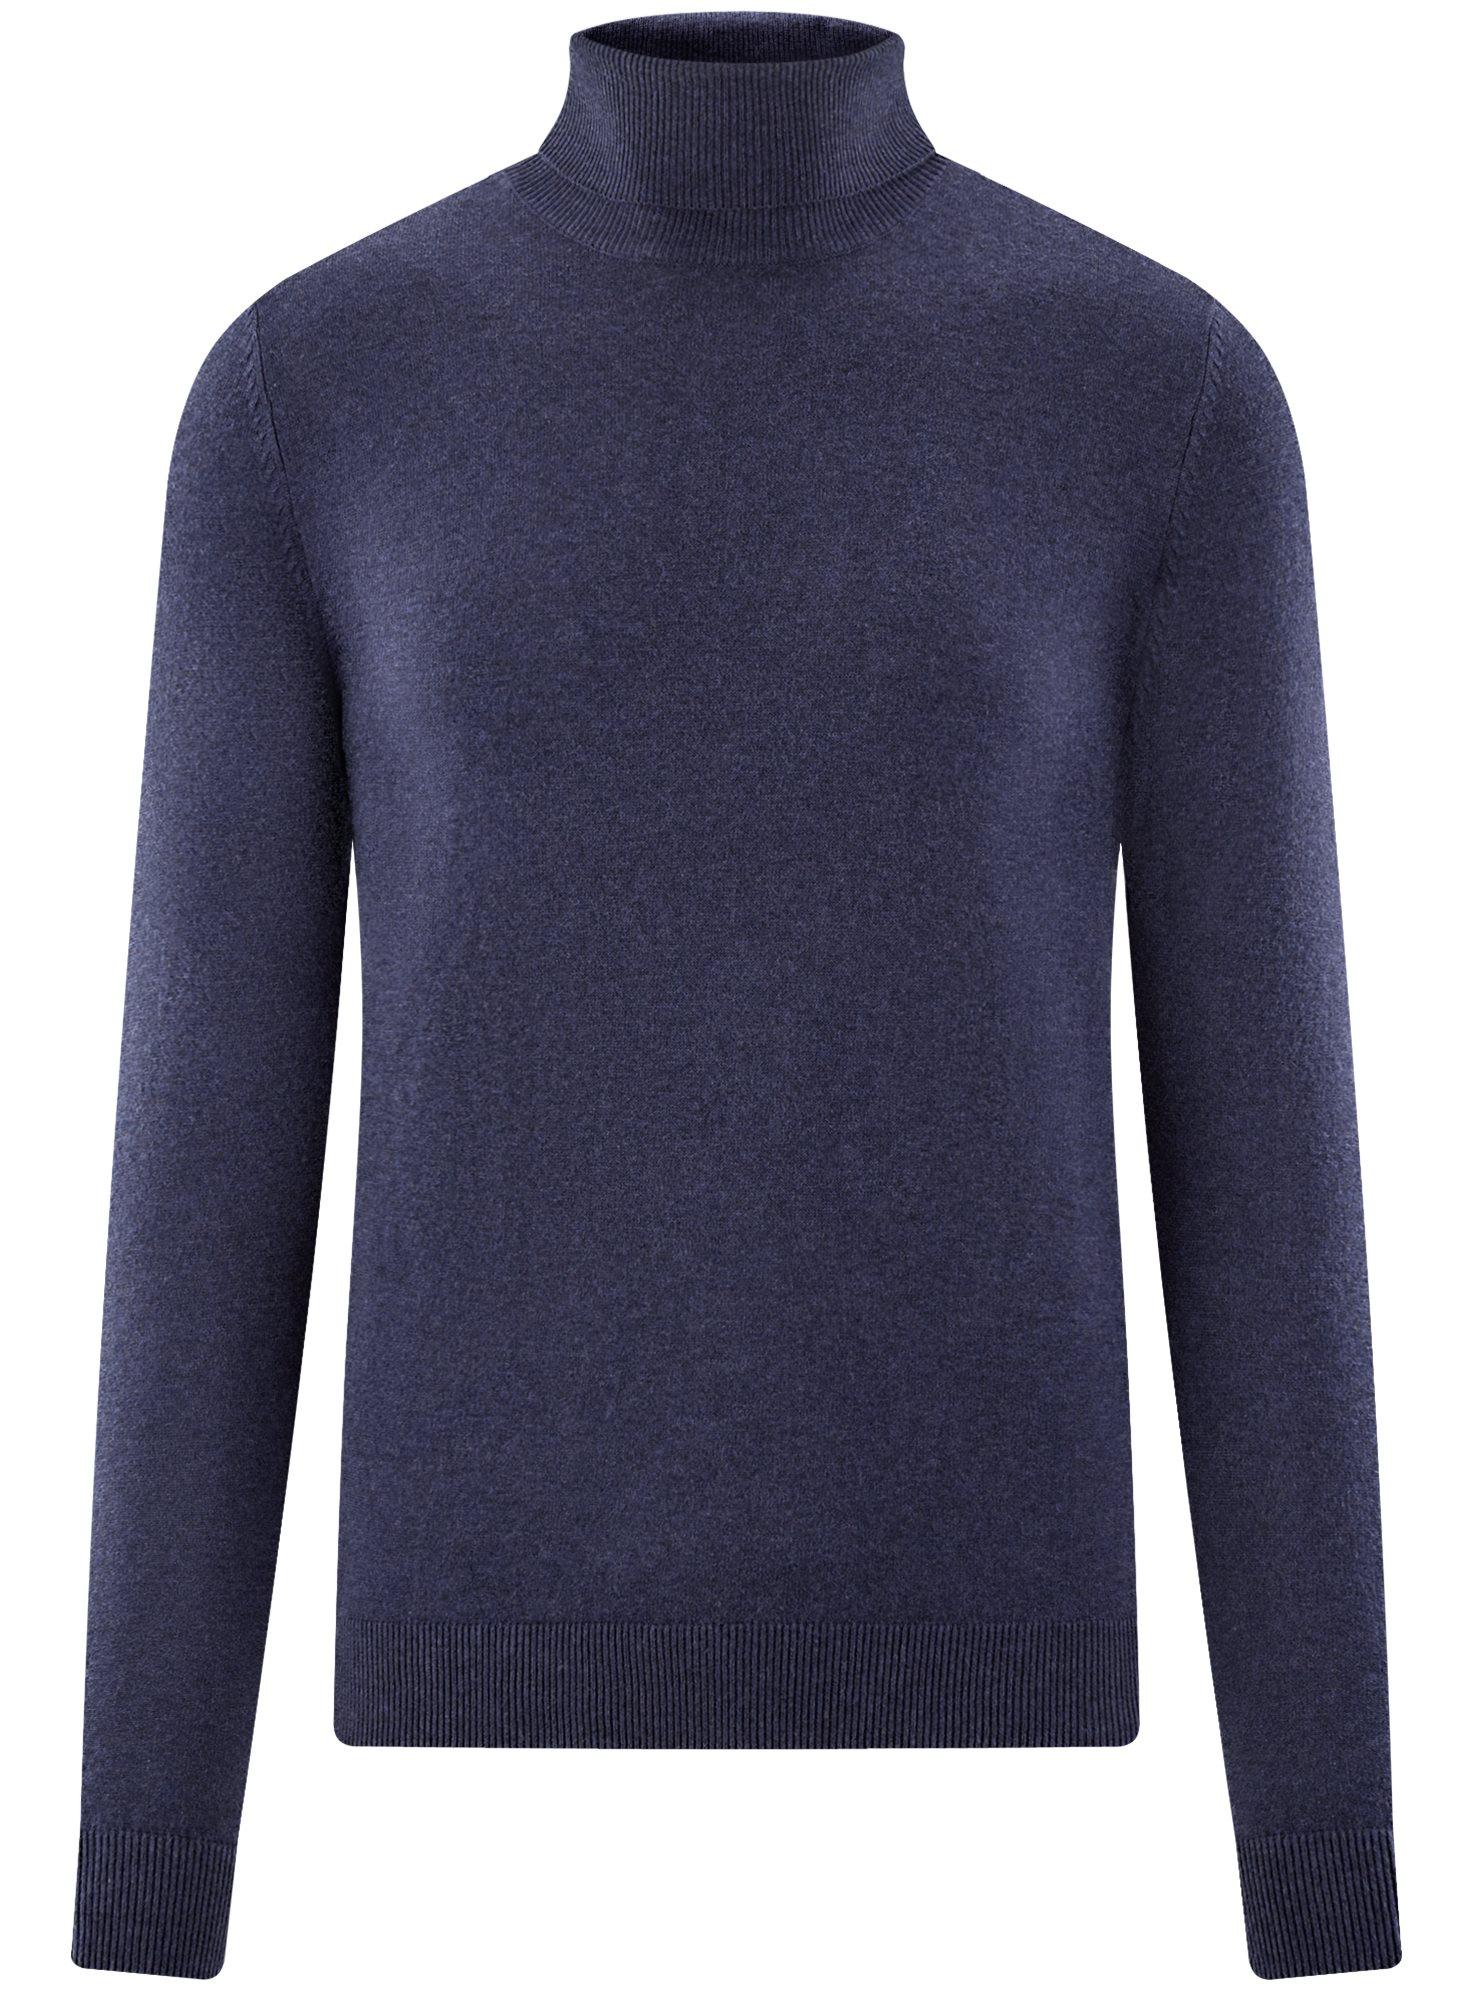 Свитер базовый из хлопка oodji для мужчины (синий), 4B312003M-1/34390N/7900M